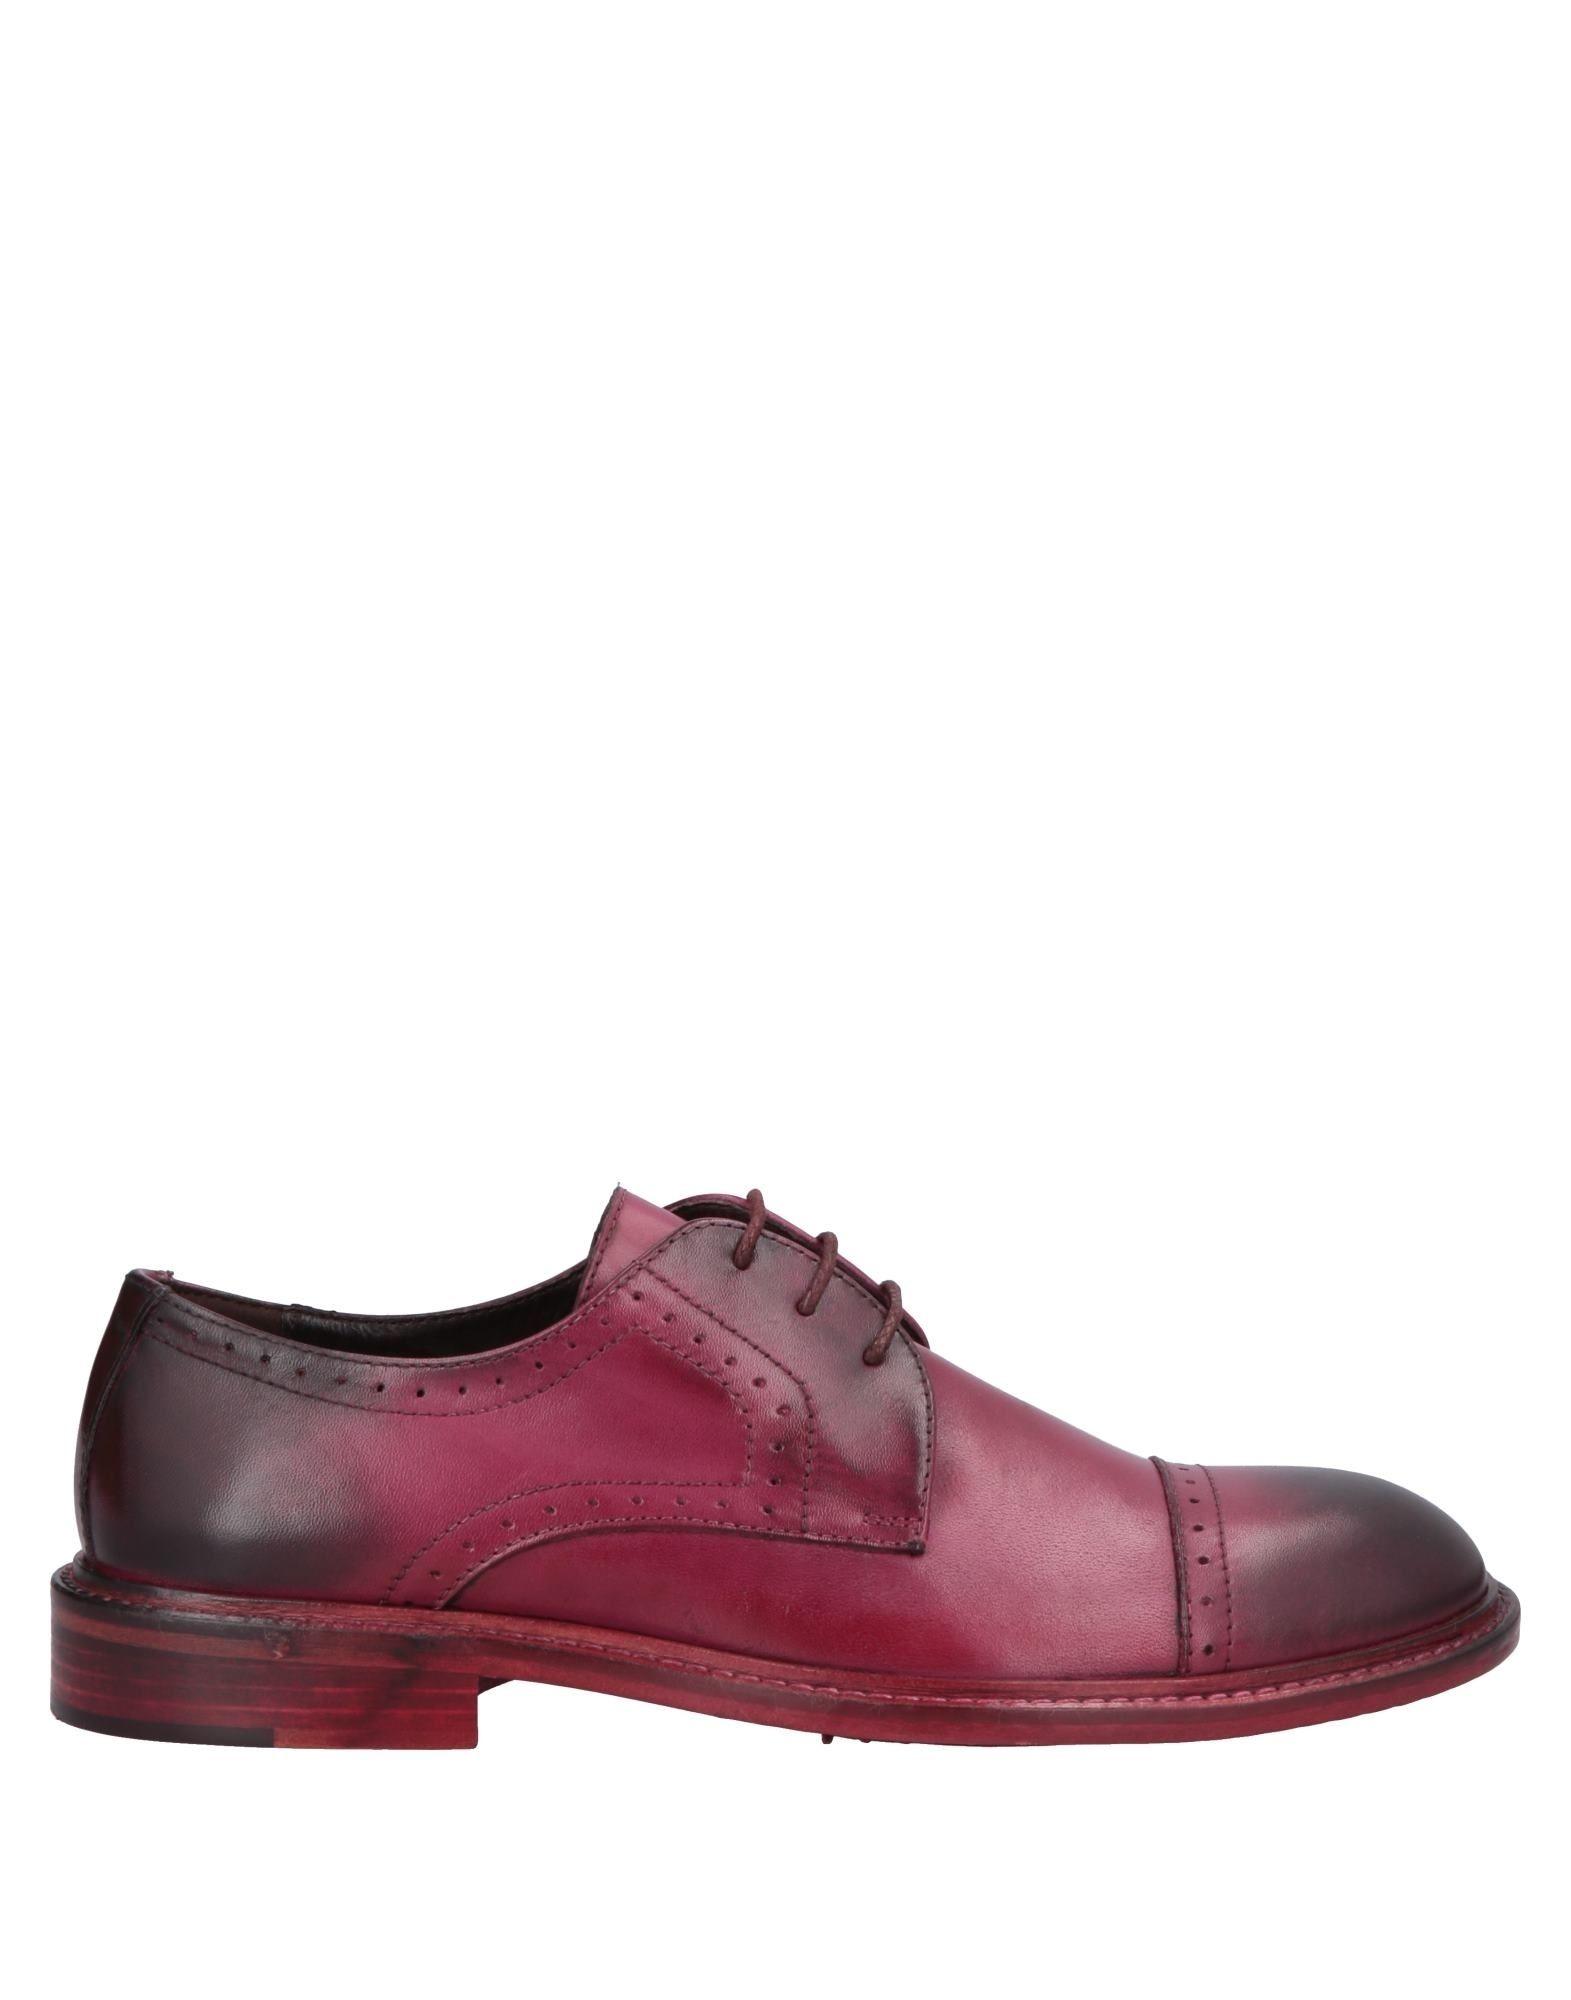 RICHARD LARS Обувь на шнурках полукресло lars